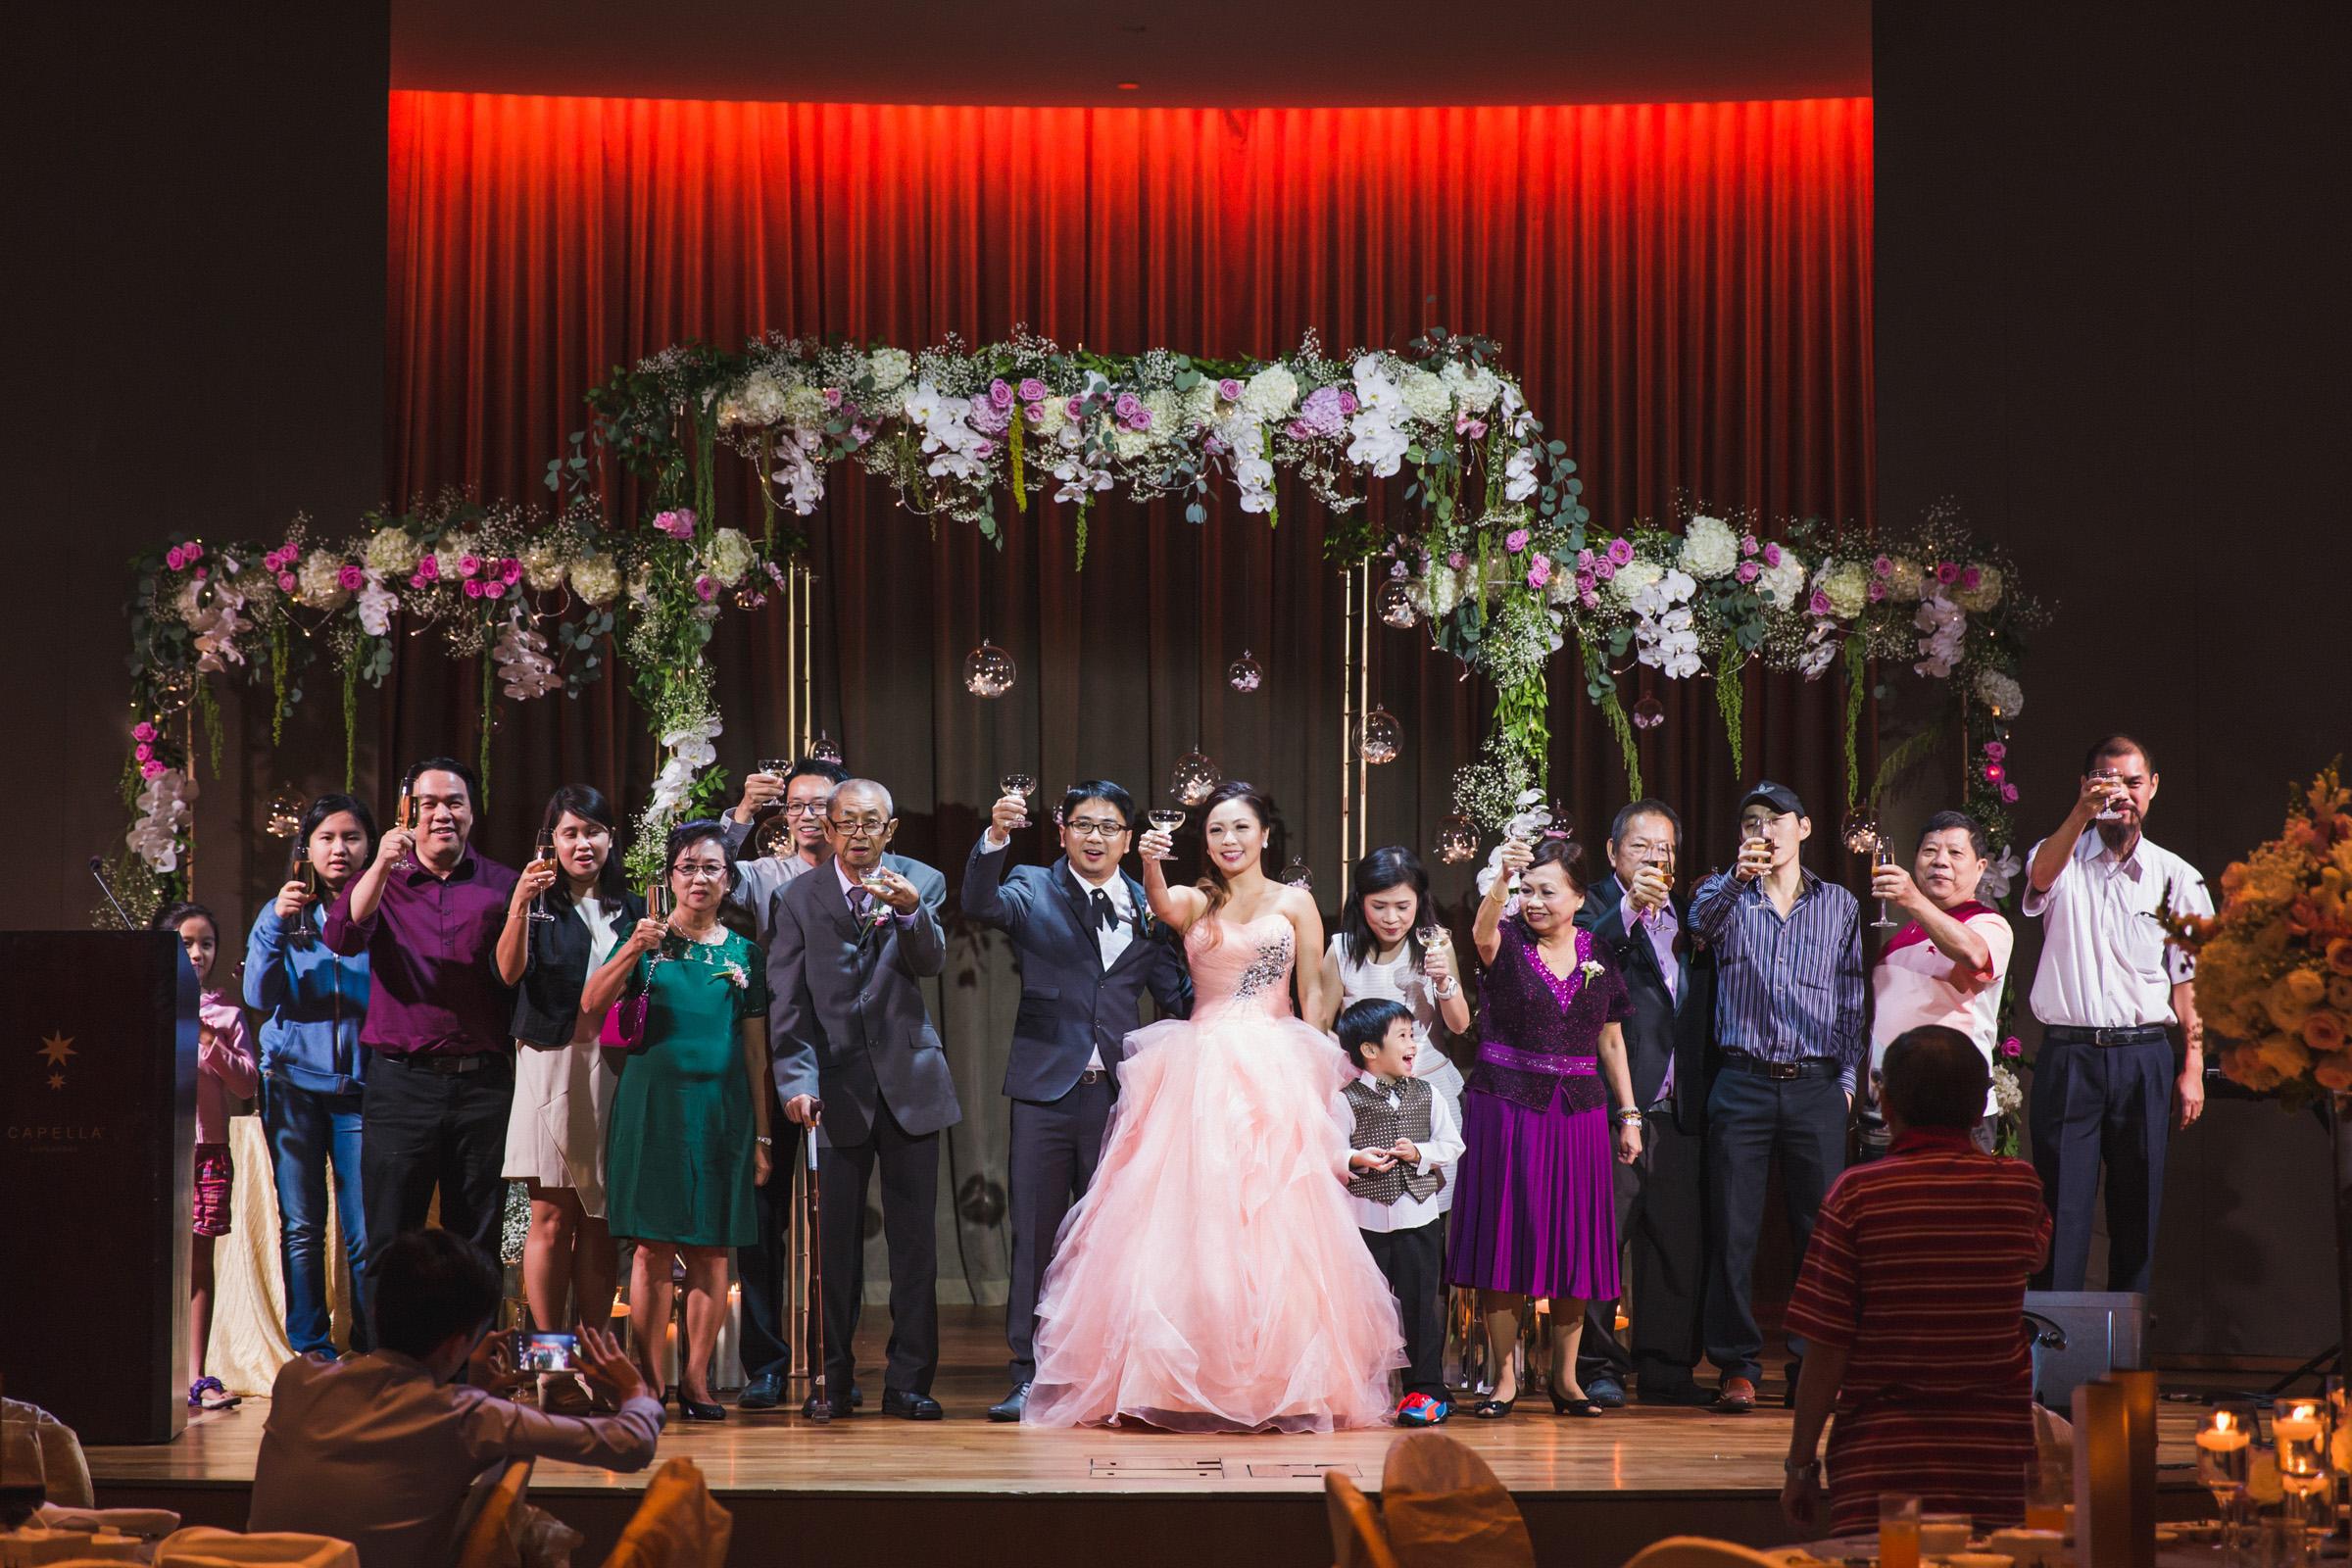 Steven_Jasmine_Wedding_Walldrobe Photography_Wedding shoots_Actual day wedding_Photographer (4)